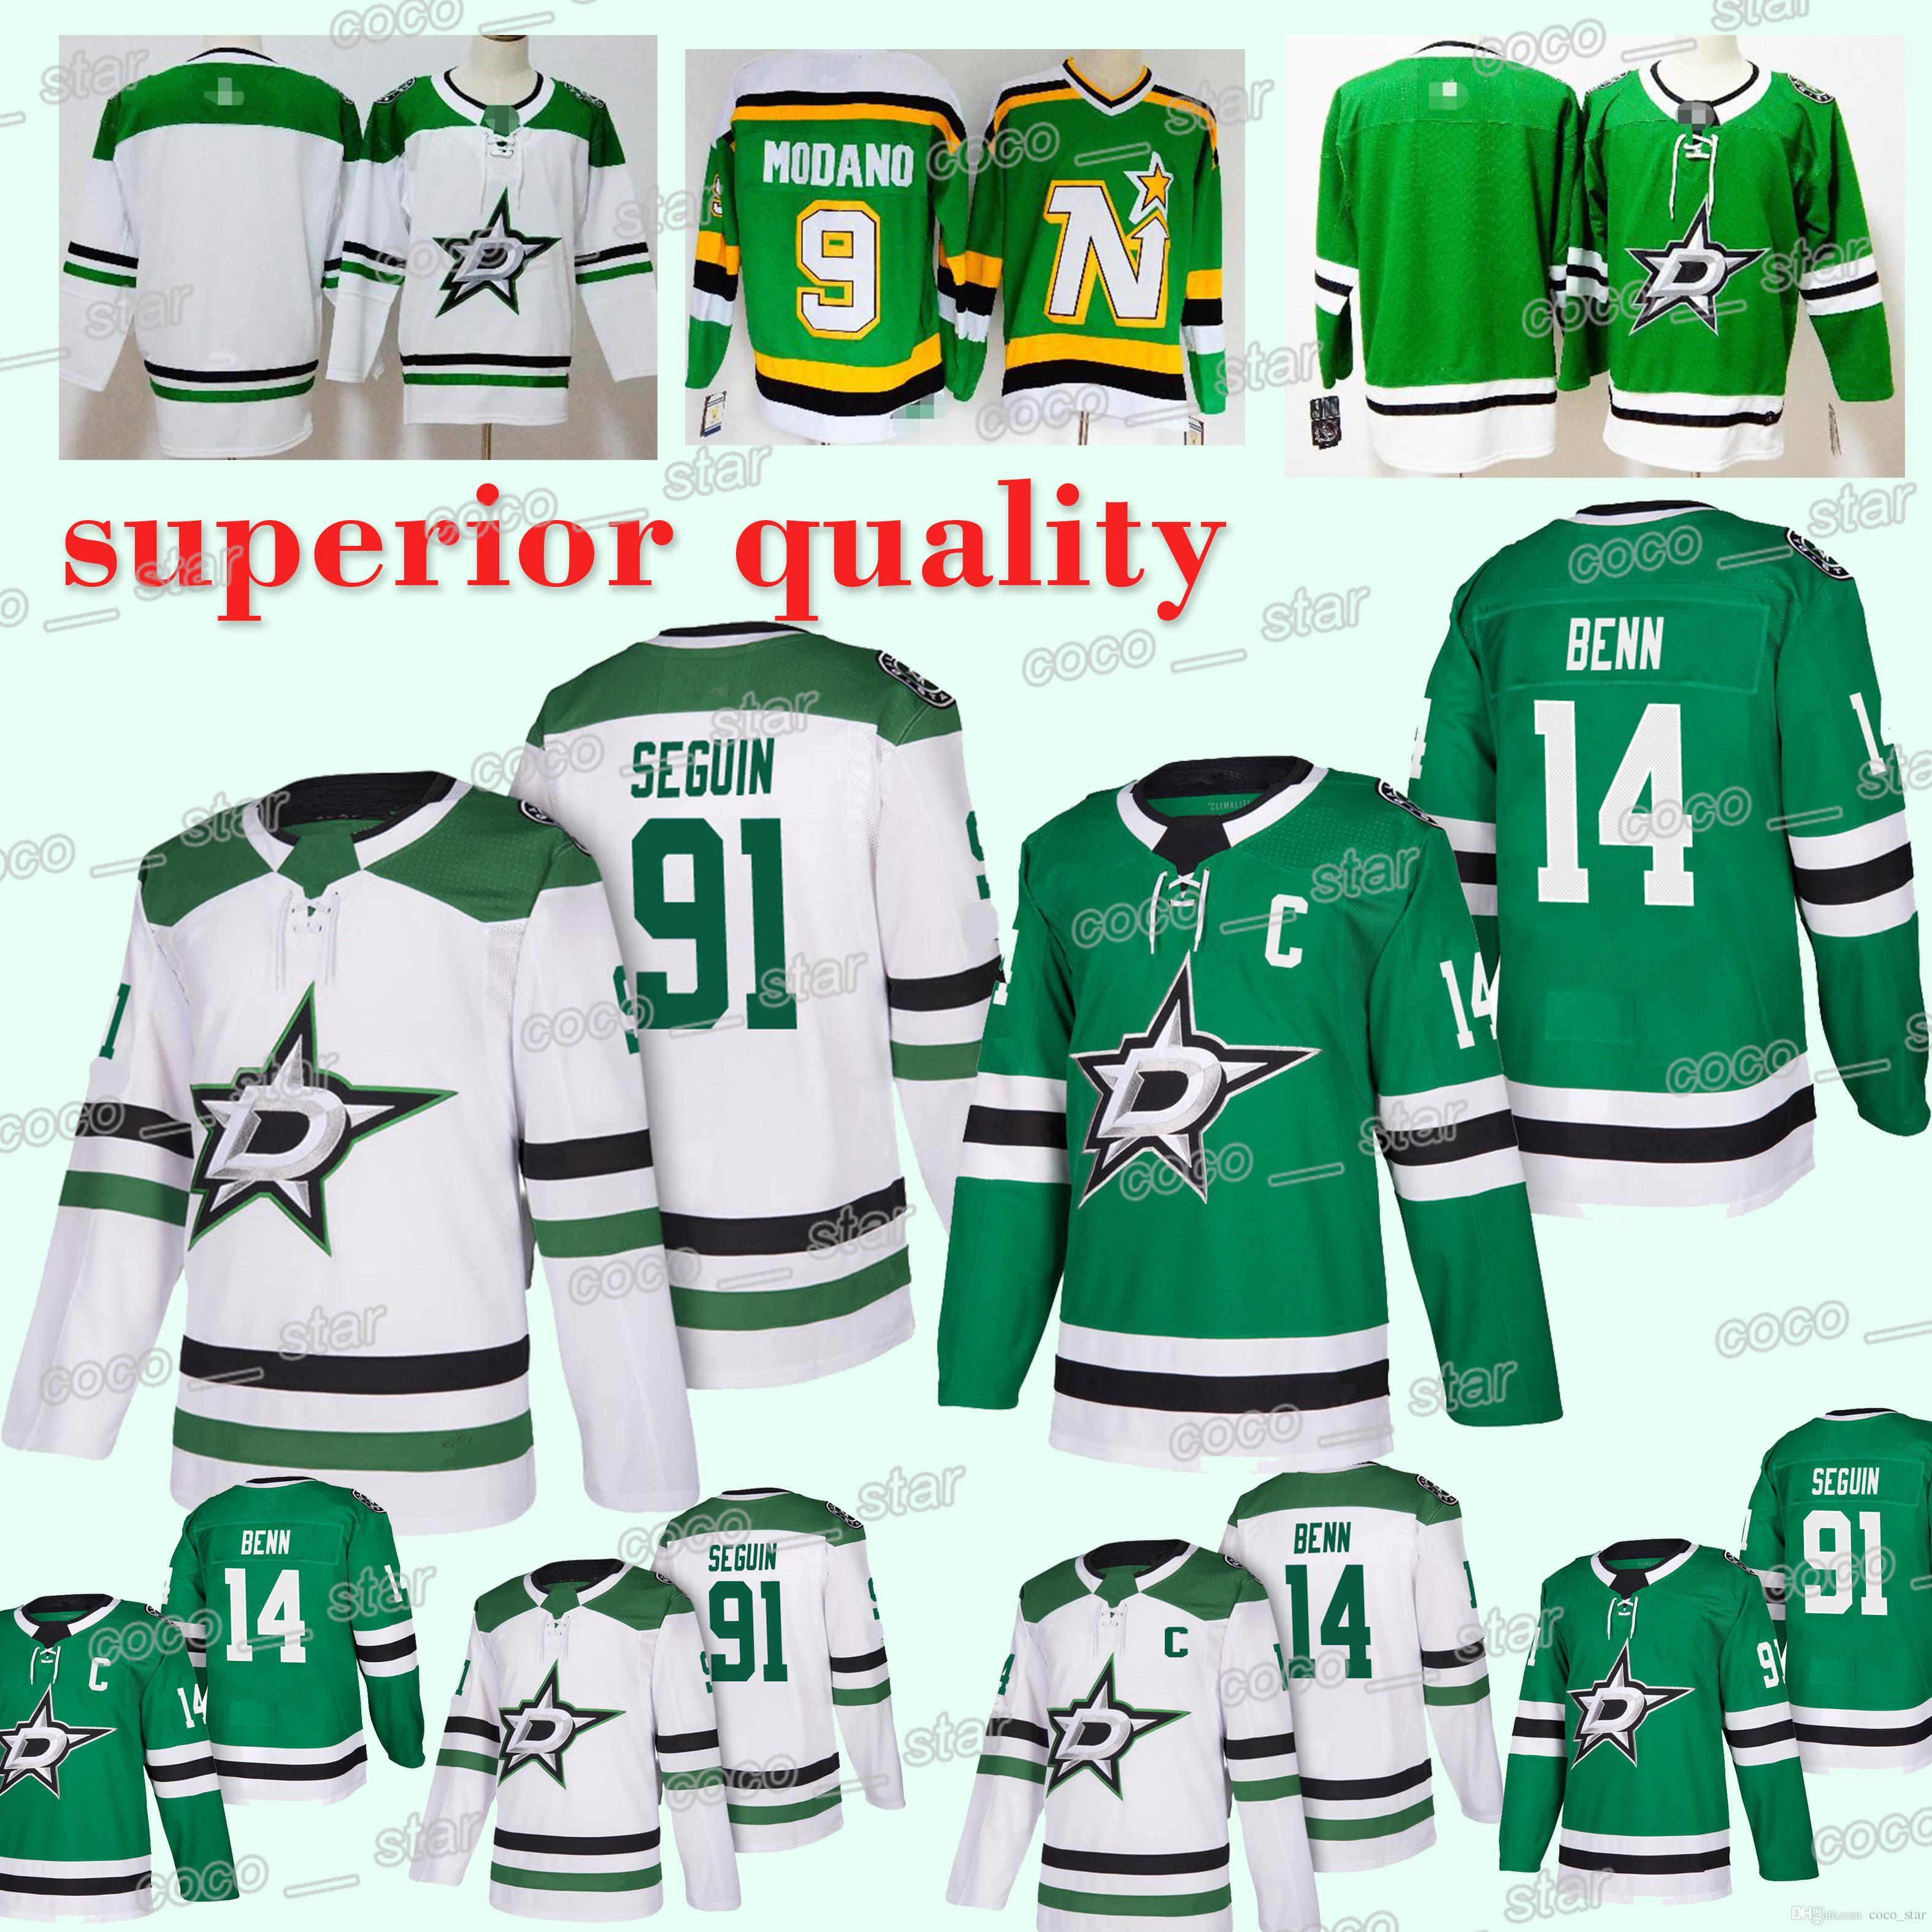 newest 7b21b ce3b0 NEW Dallas Stars 91 Tyler Seguin jersey 14 Jamie Benn High-quality Free  shopping Hot sale new Hockey sportswear